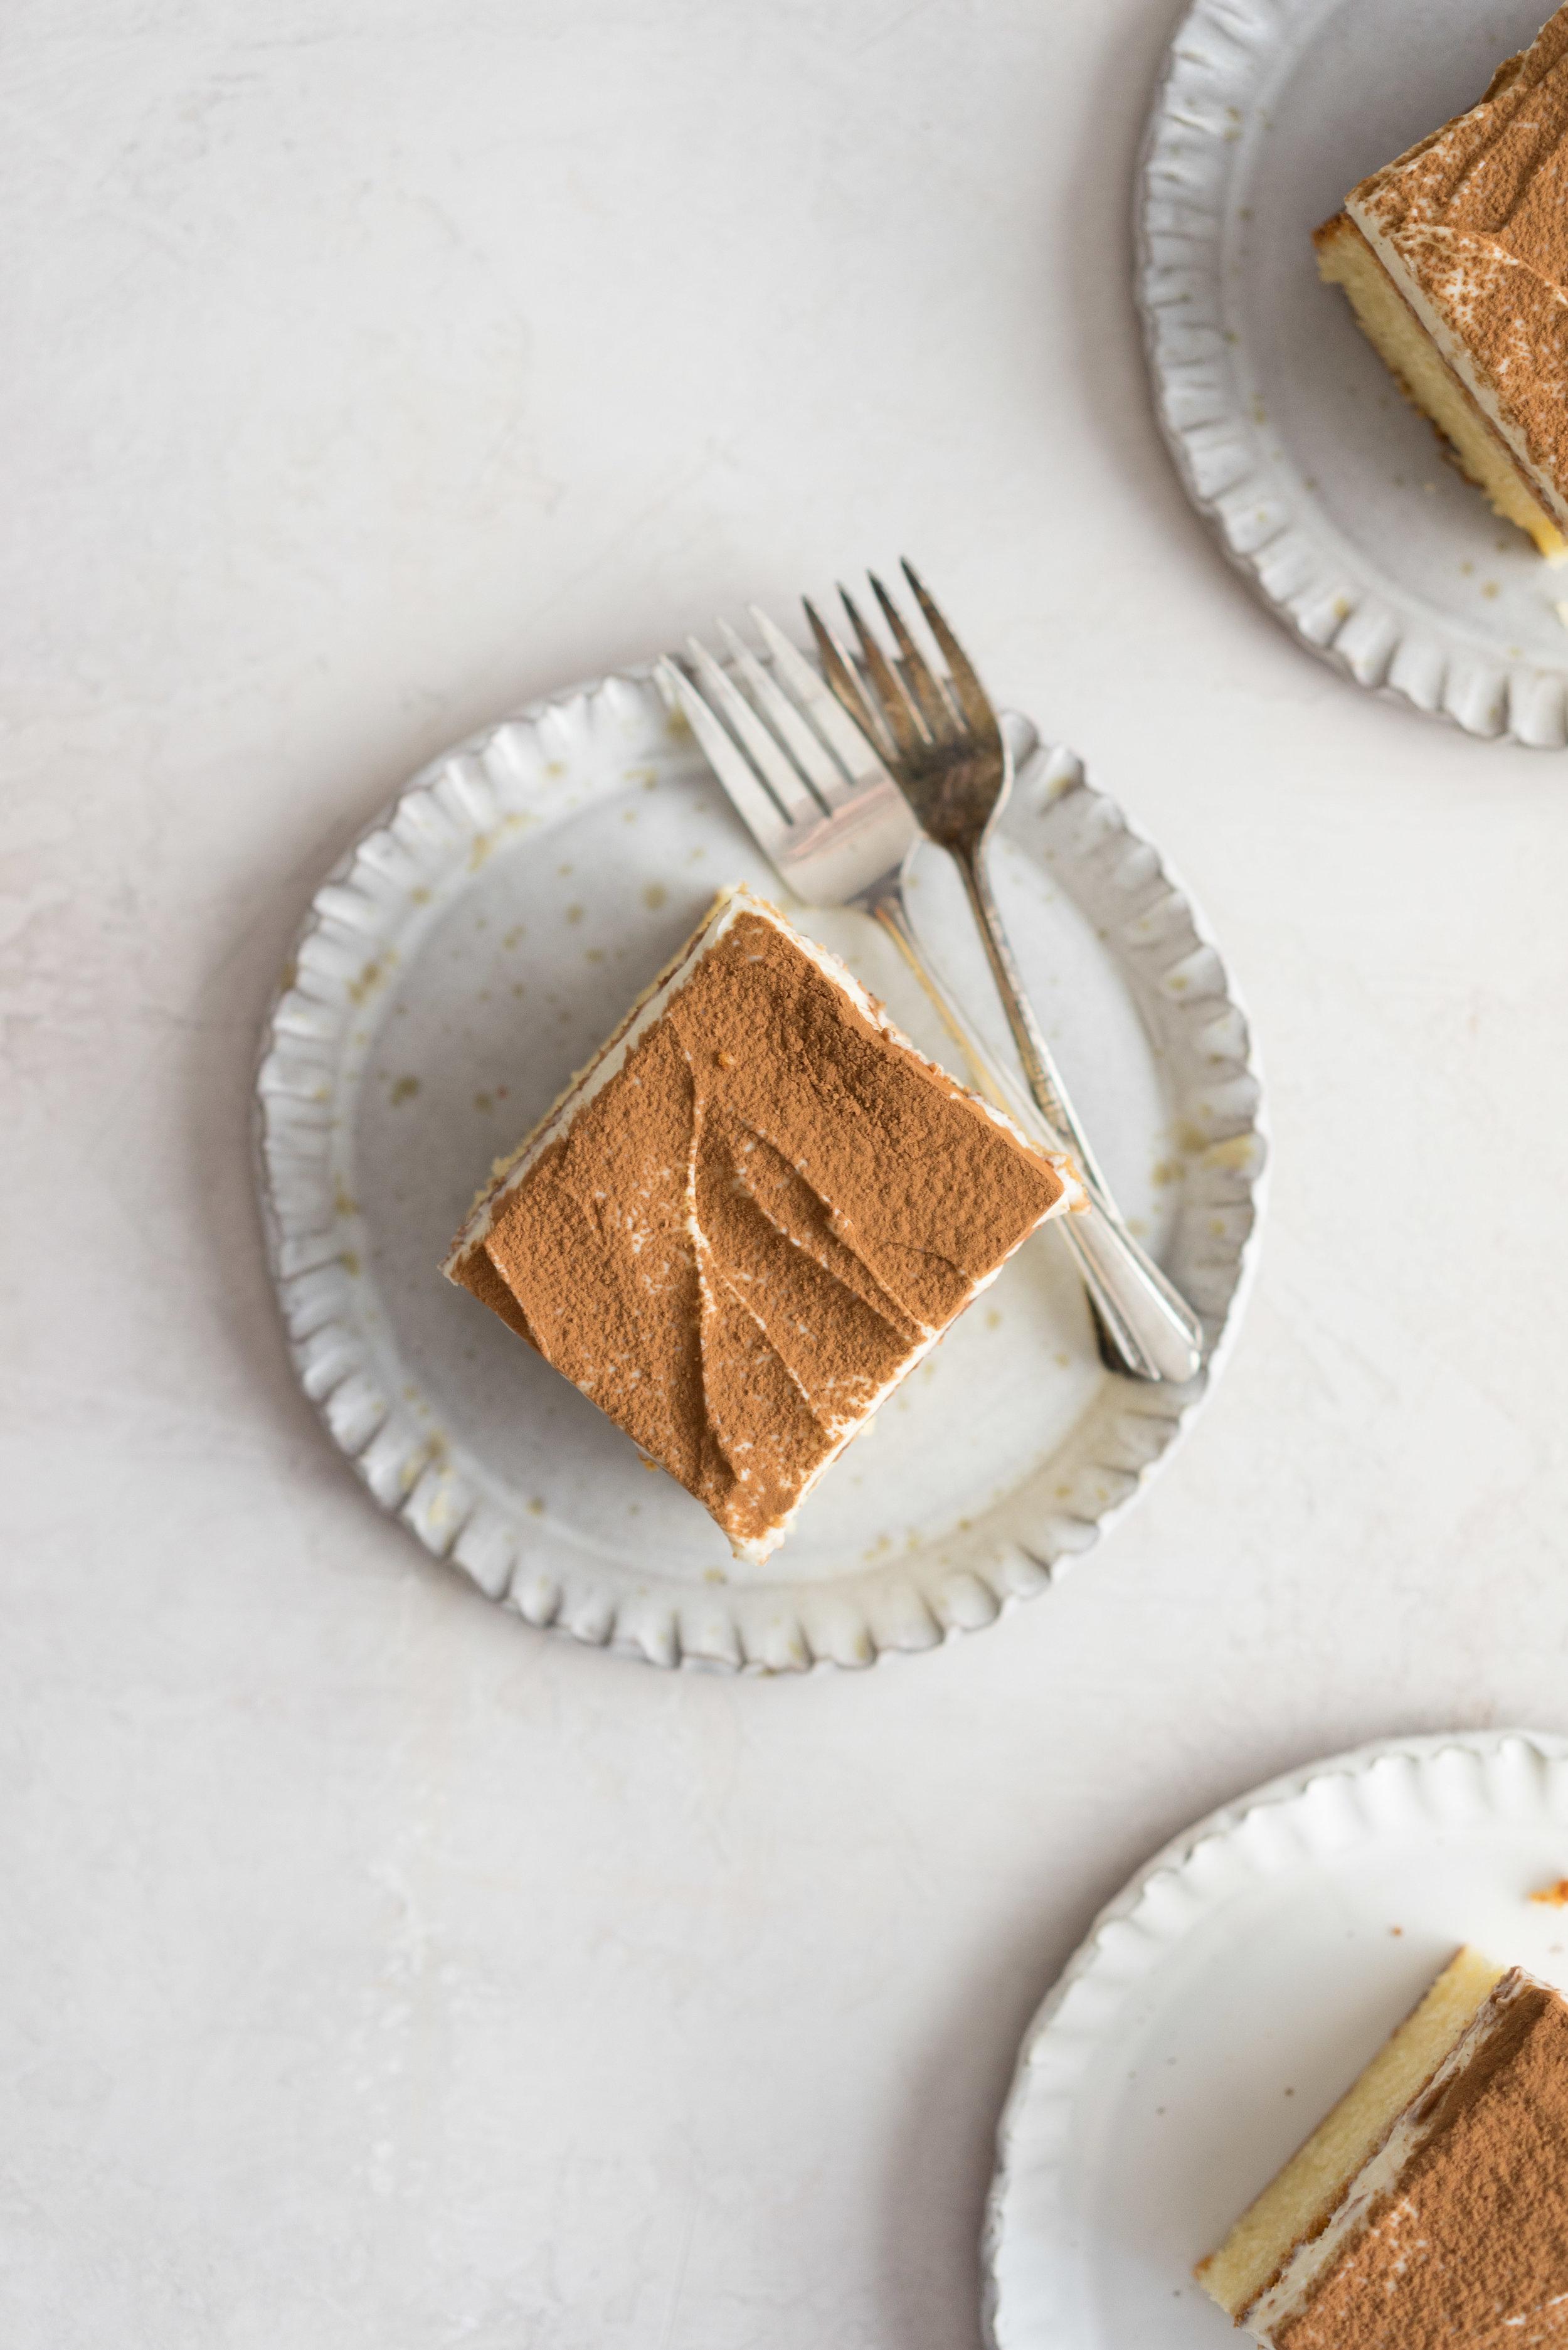 Tiramisu Sheet Cake - vanilla sheet cake, soaked in coffee, and finished with a creamy mascarpone frosting - www.cloudykitchen.com #sheetcake #tiramisu